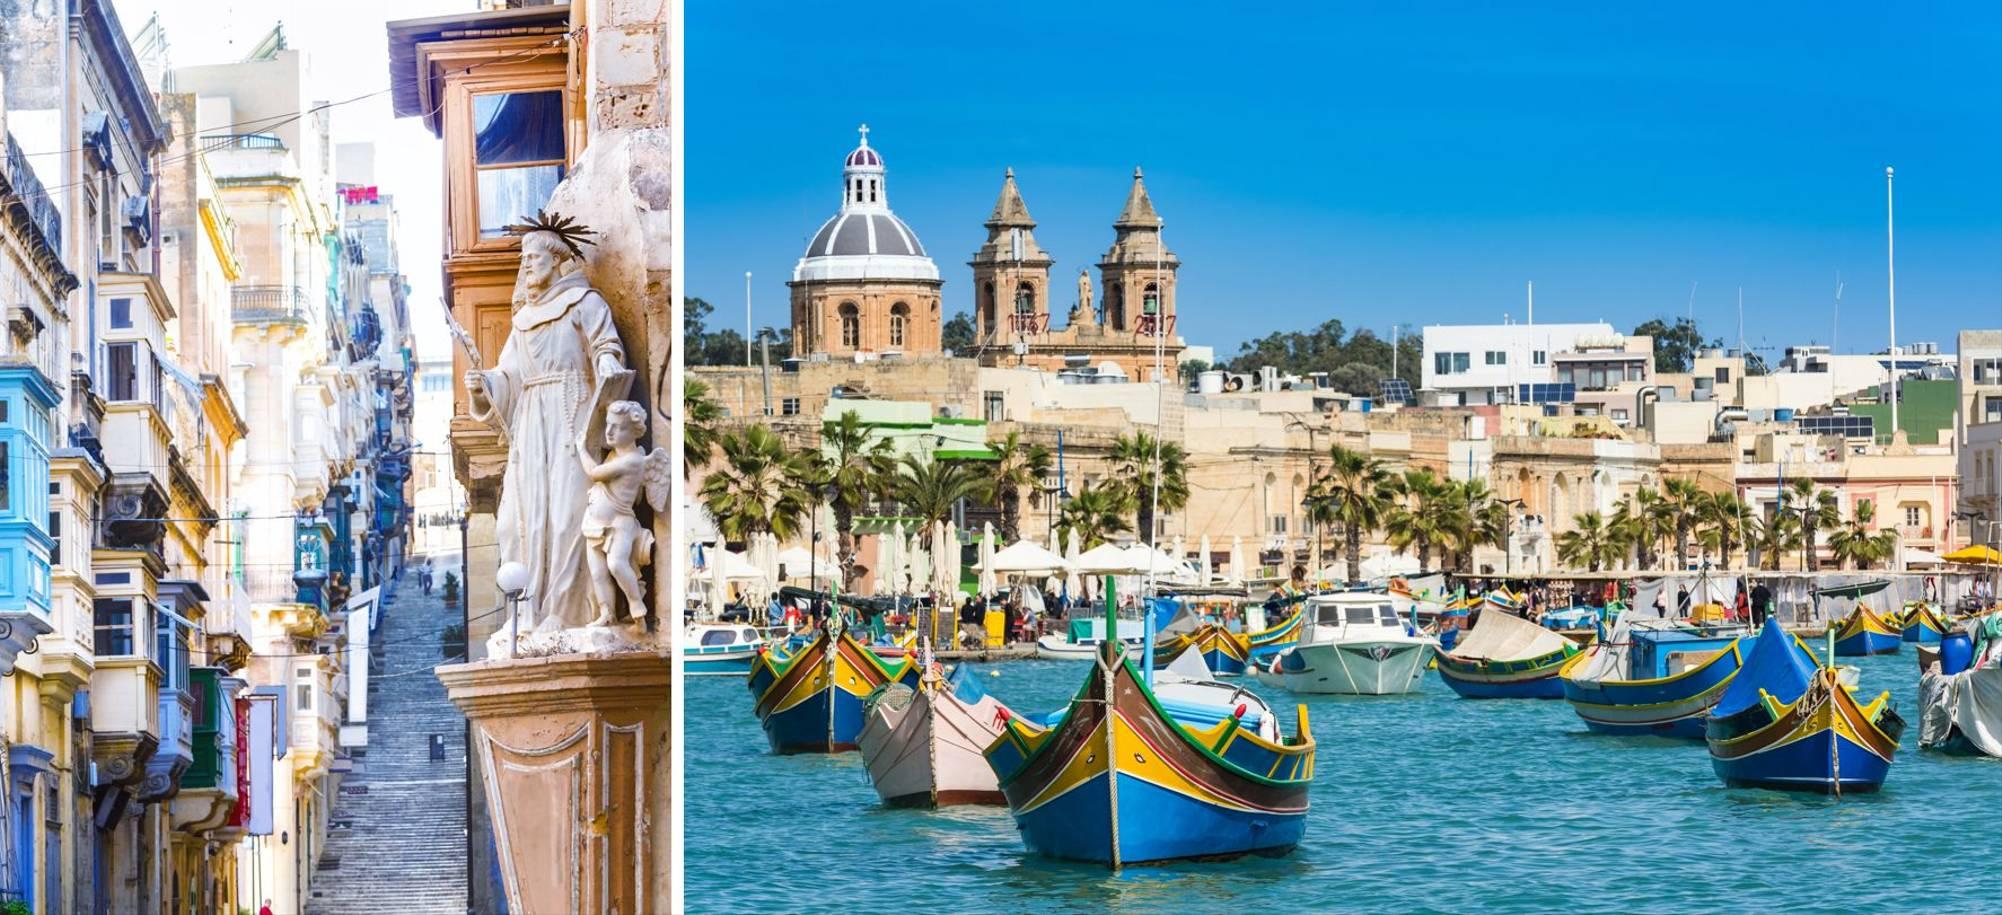 19 Day - Valletta, City streets - Itinerary Desktop.jpg